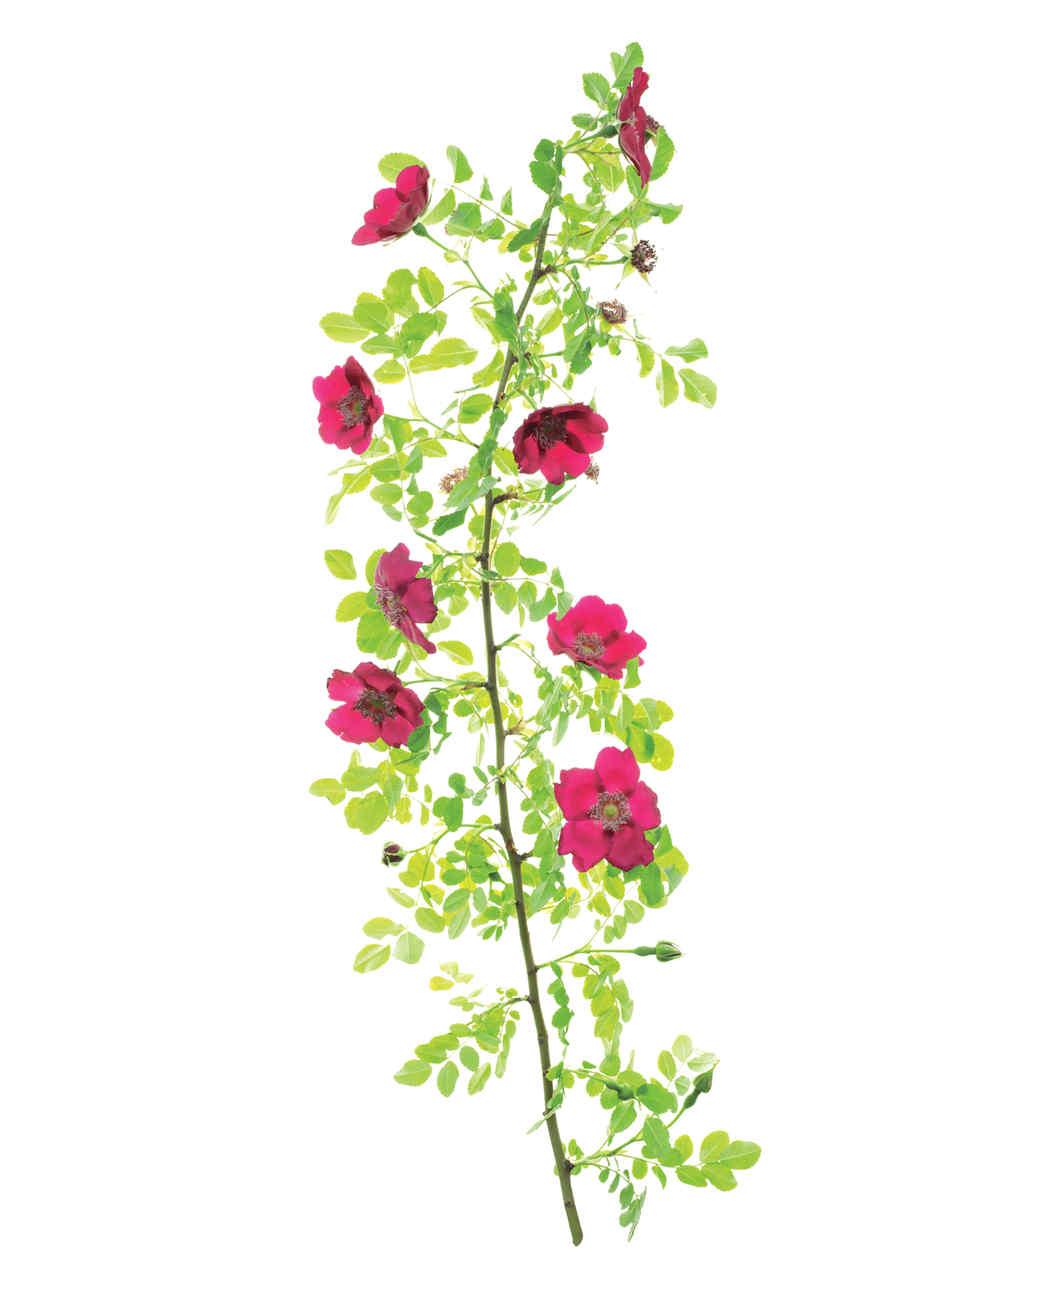 highdownensis-rose-ms108508.jpg